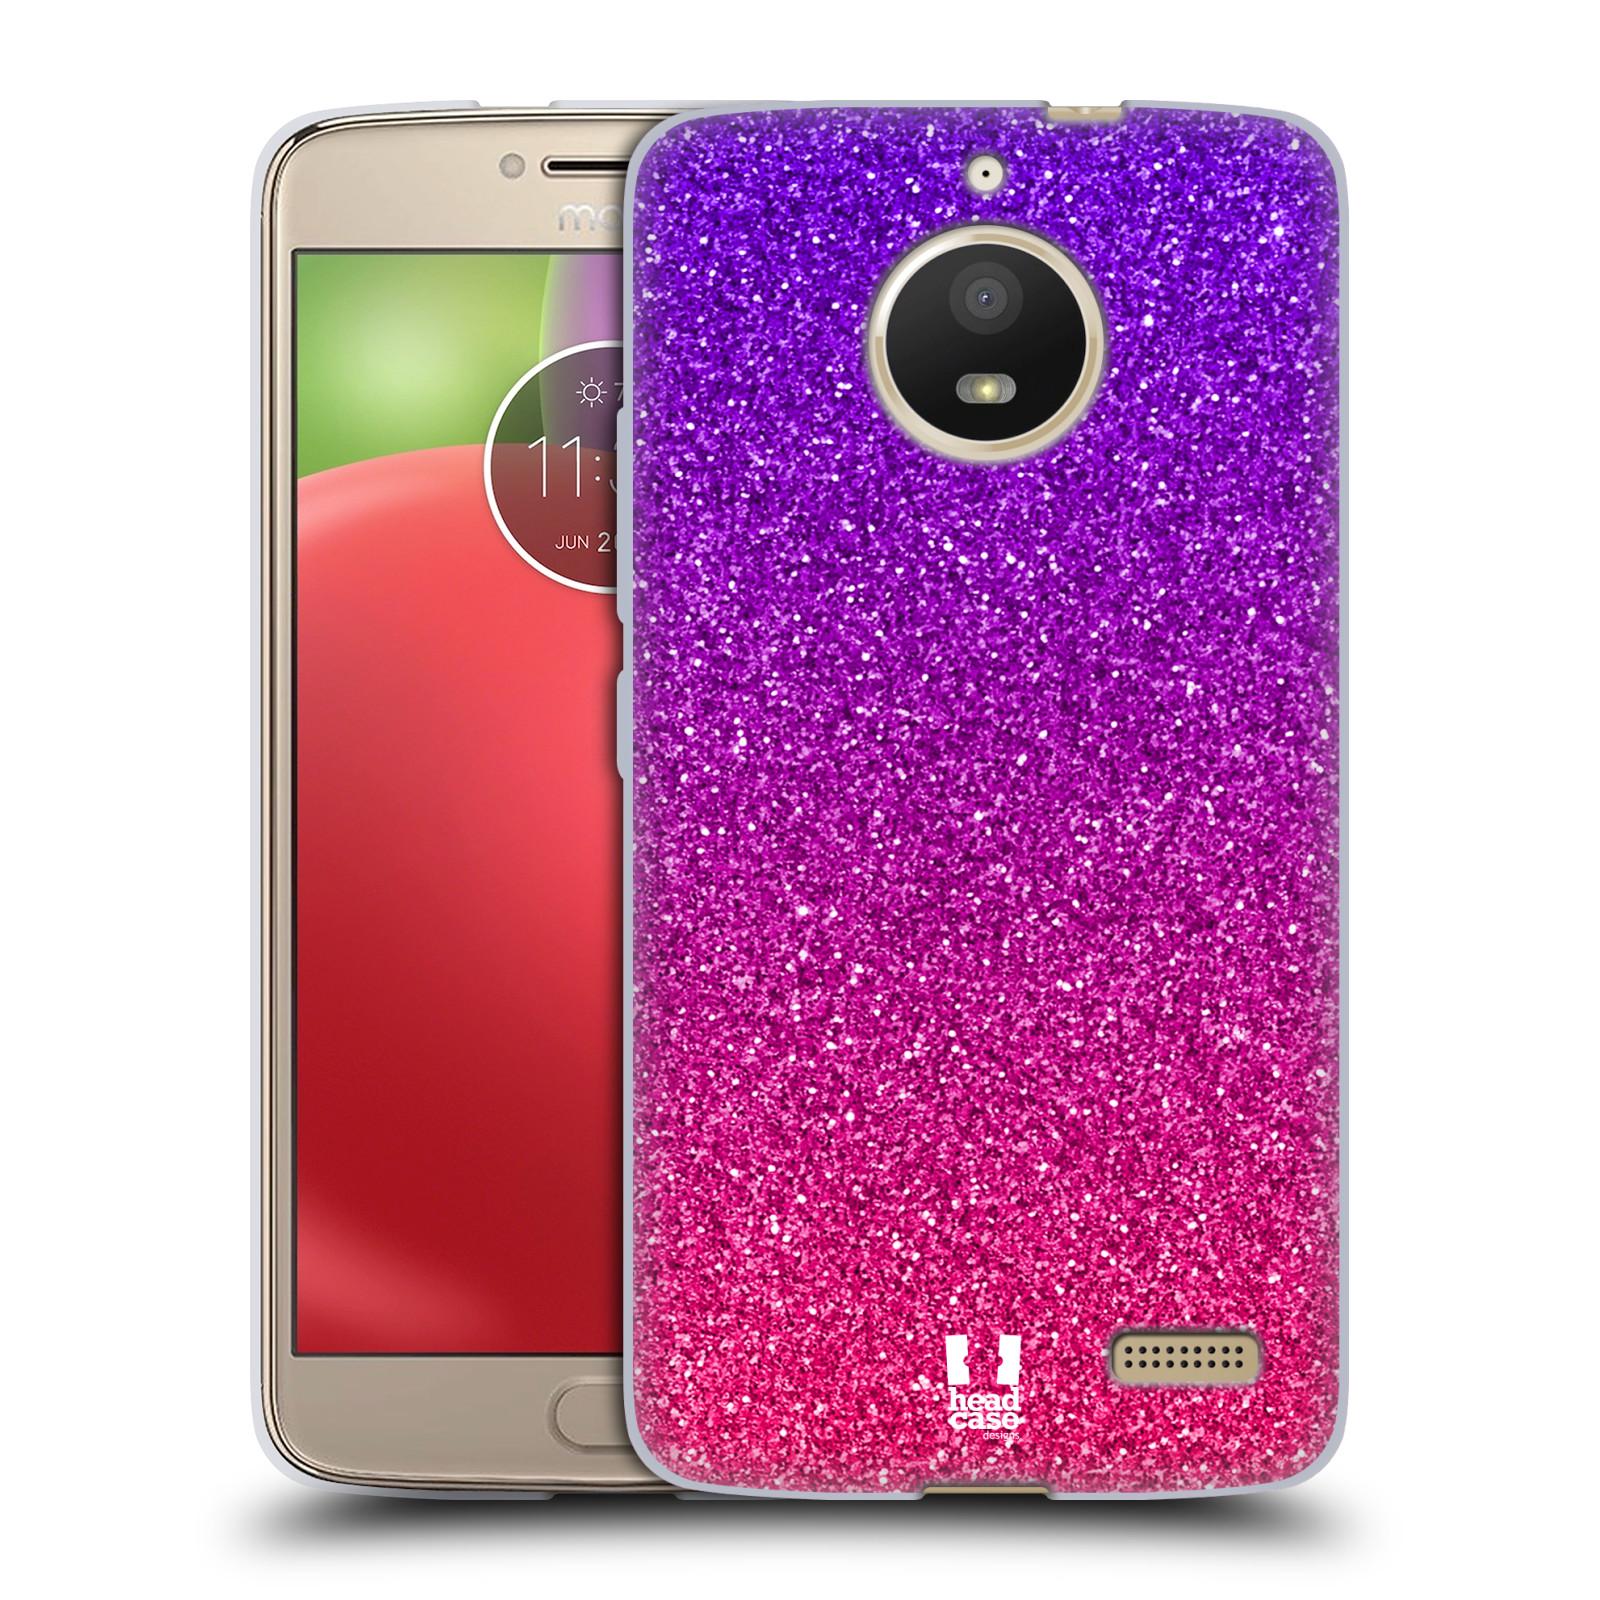 Silikonové pouzdro na mobil Lenovo Moto E4 - Head Case - Mix Pink (Silikonový kryt či obal na mobilní telefon Lenovo Moto E4 s motivem Mix Pink)